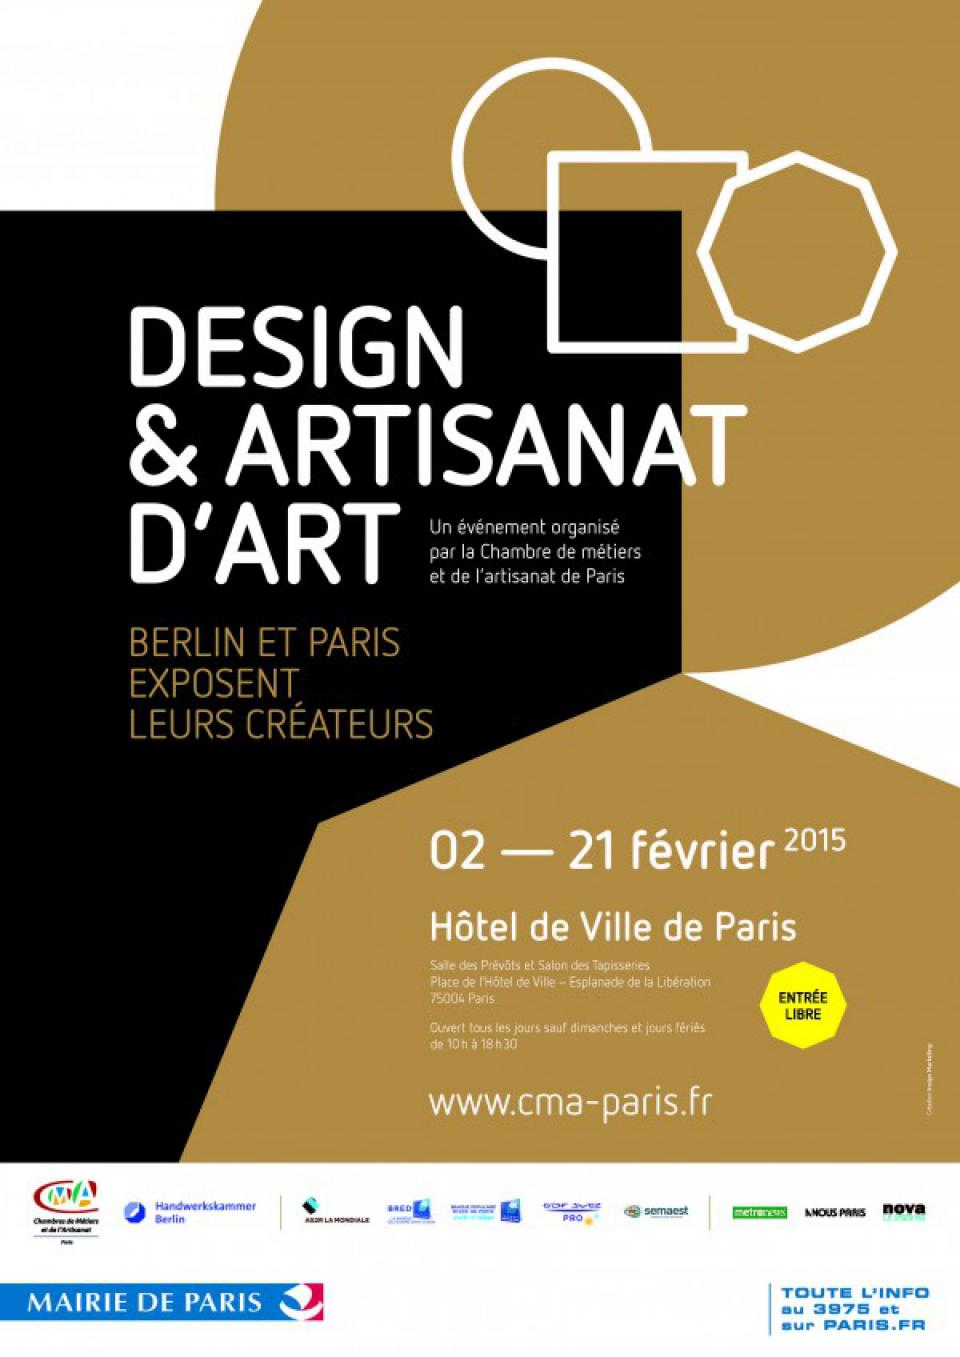 expo_-_design_et_artisannat_dart_affiche_0215_0